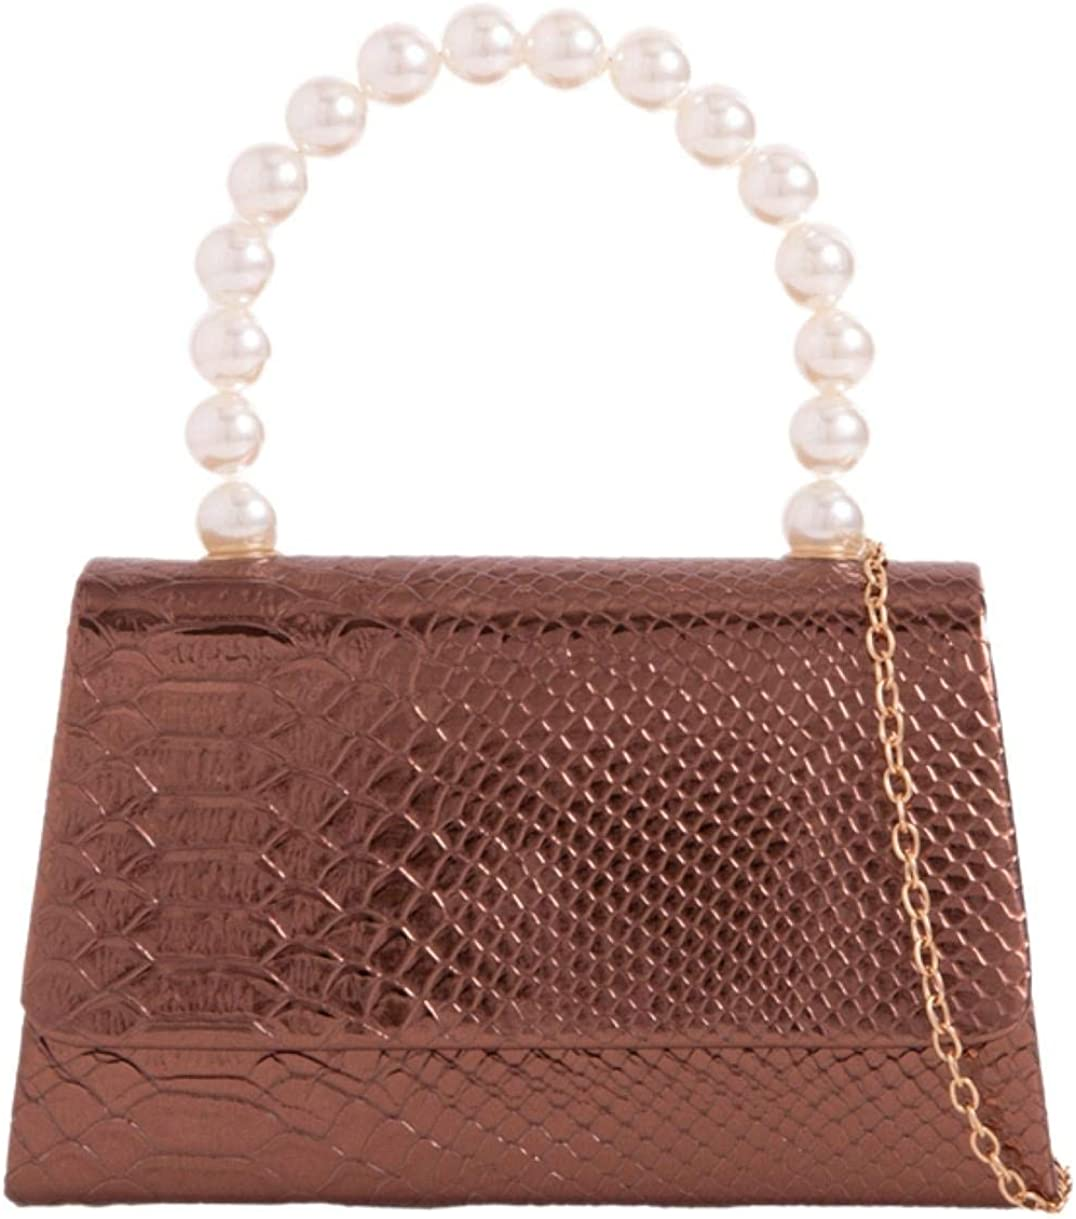 Girly Handbags Womens Metallic Croc Clutch Bag